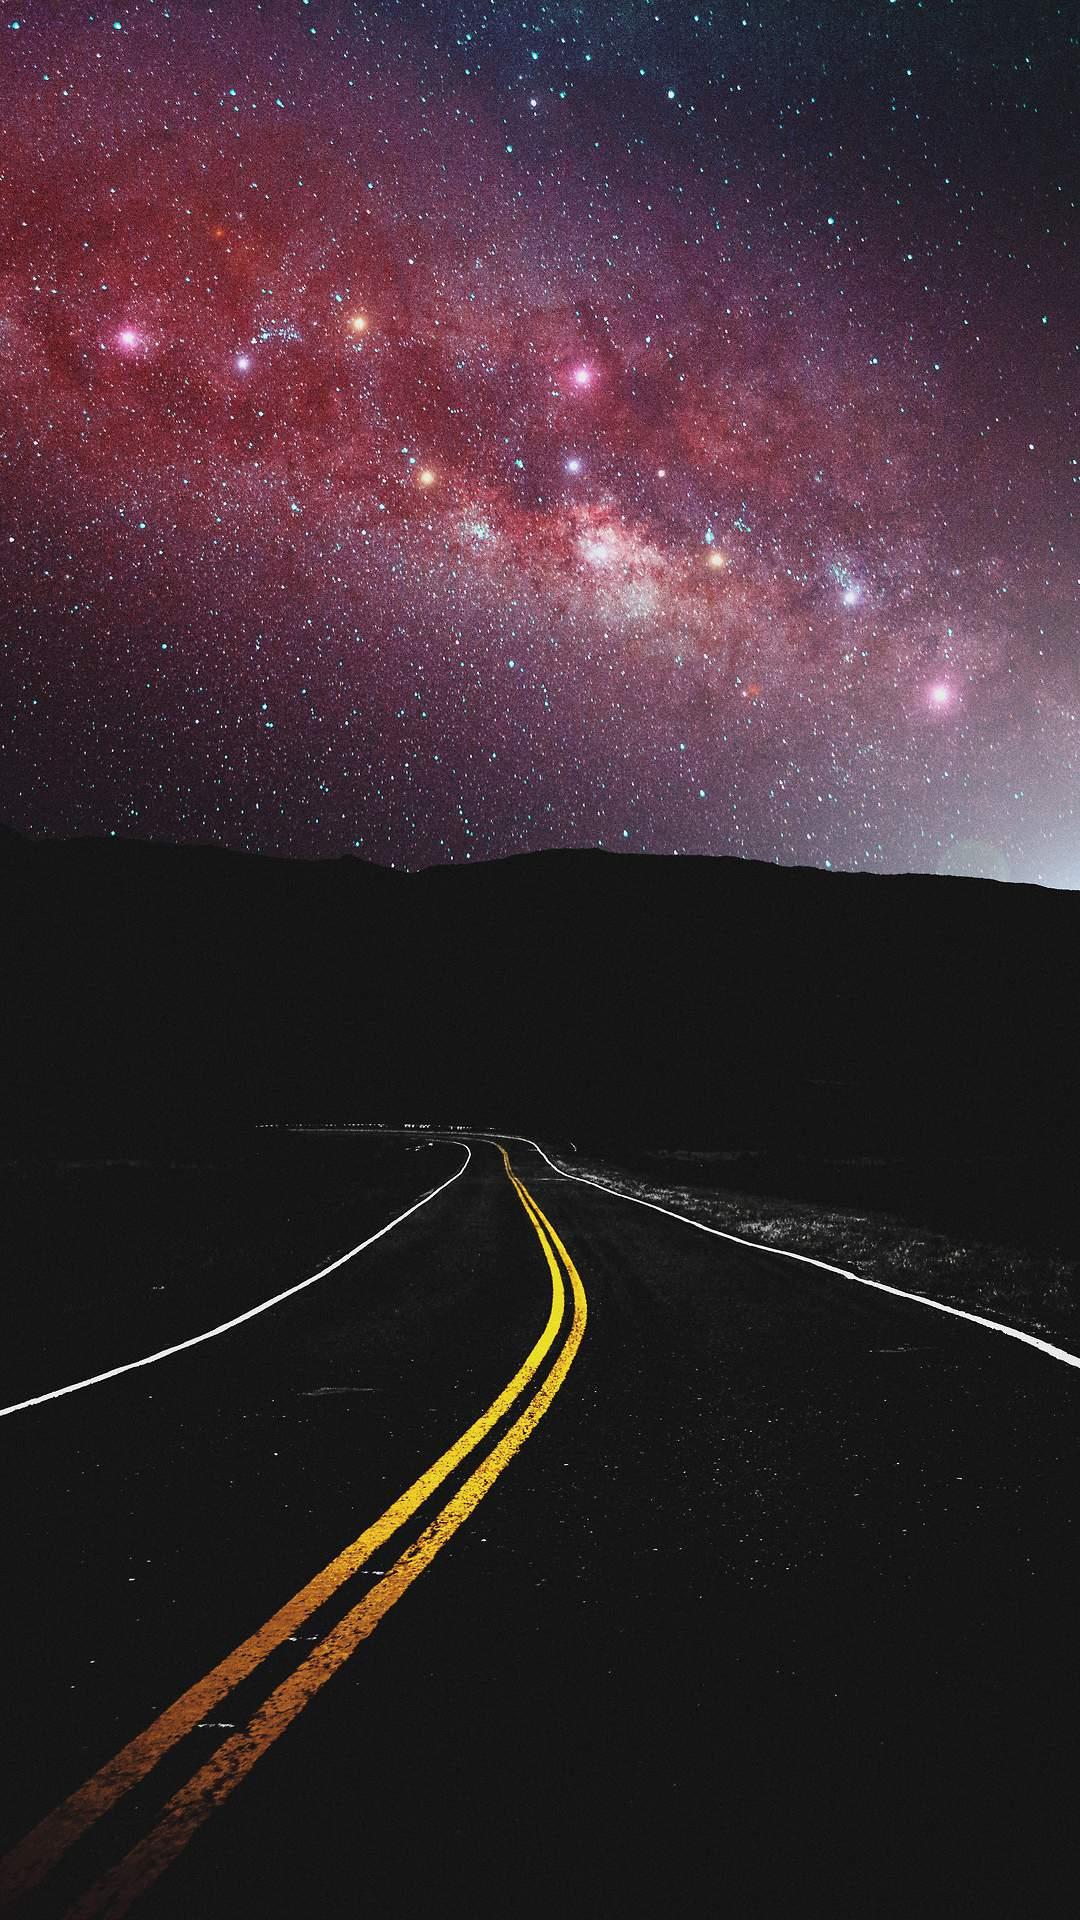 Deadpool Iphone Wallpaper Cute Milky Way View From Road Iphone Wallpaper Iphone Wallpapers